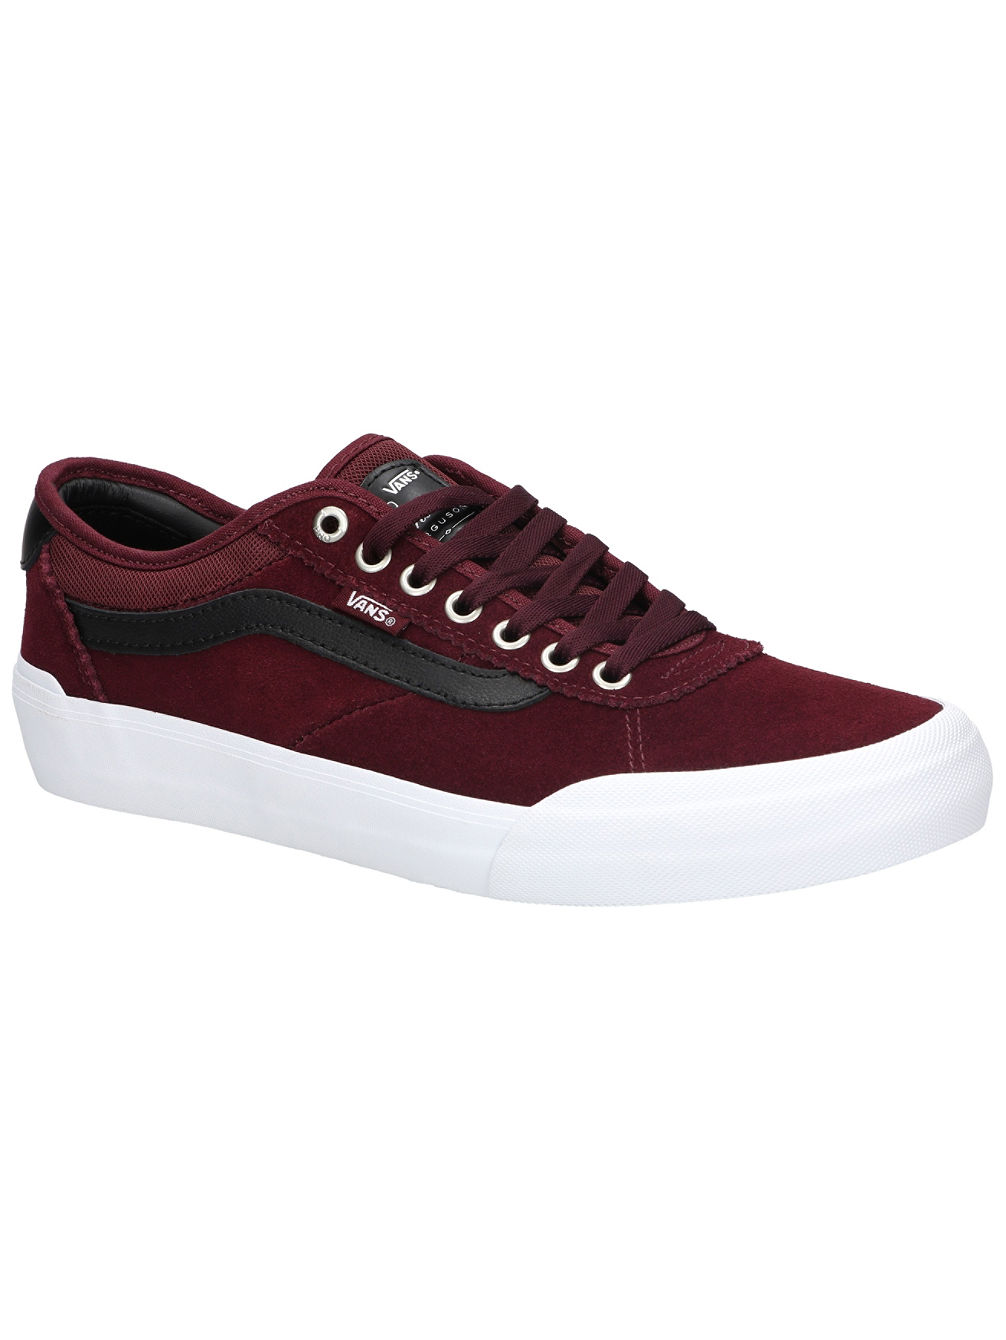 3dad1cacbc Buy Vans Mesh Chima Pro 2 Skate Shoes online at blue-tomato.com